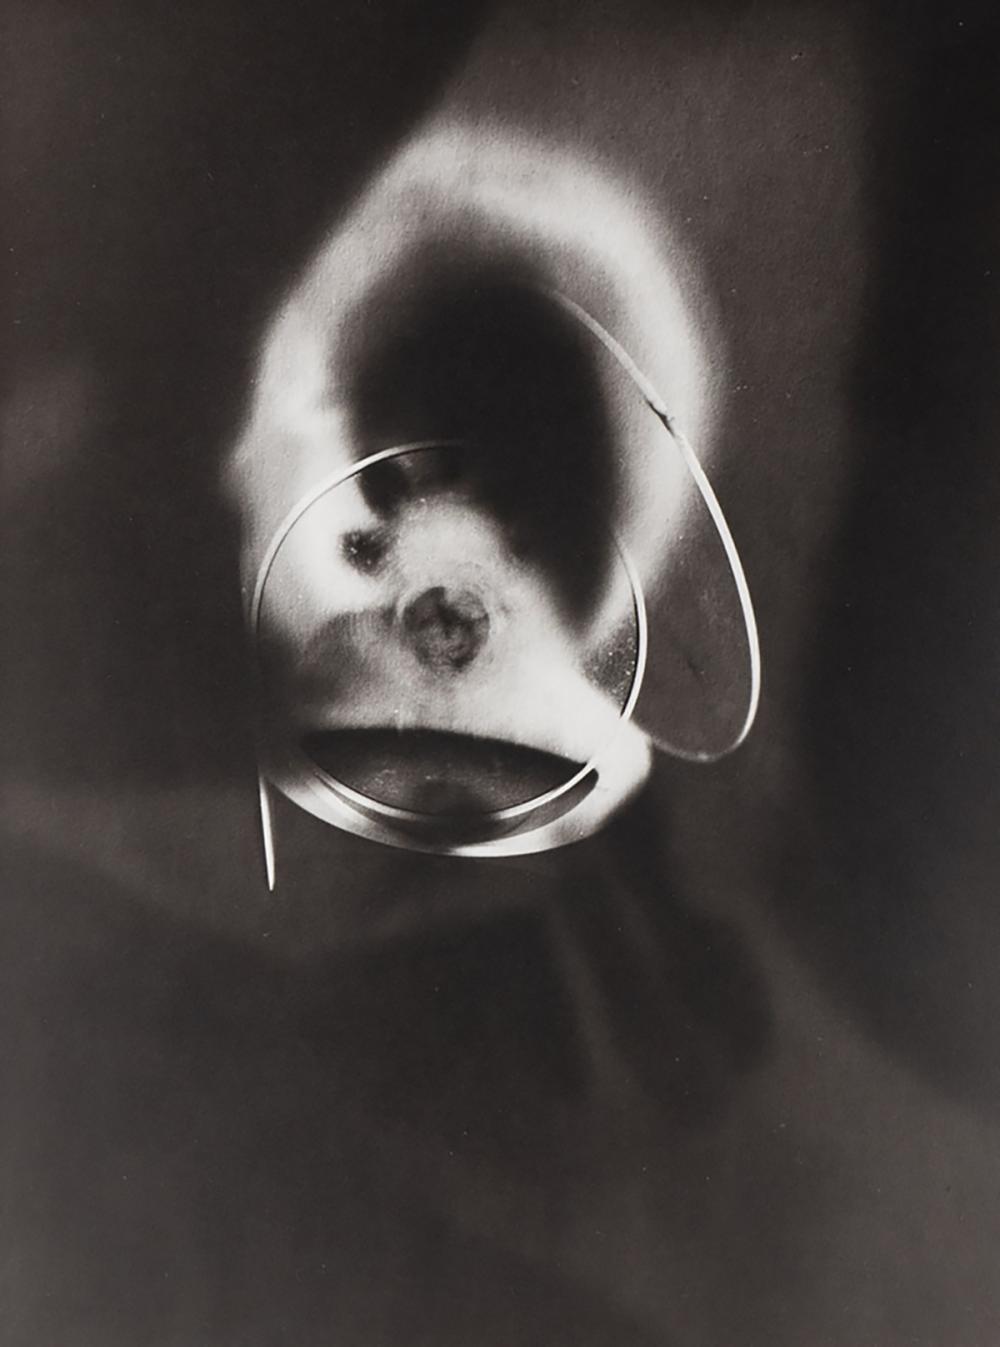 Man Ray. Rayographie, 1921/78